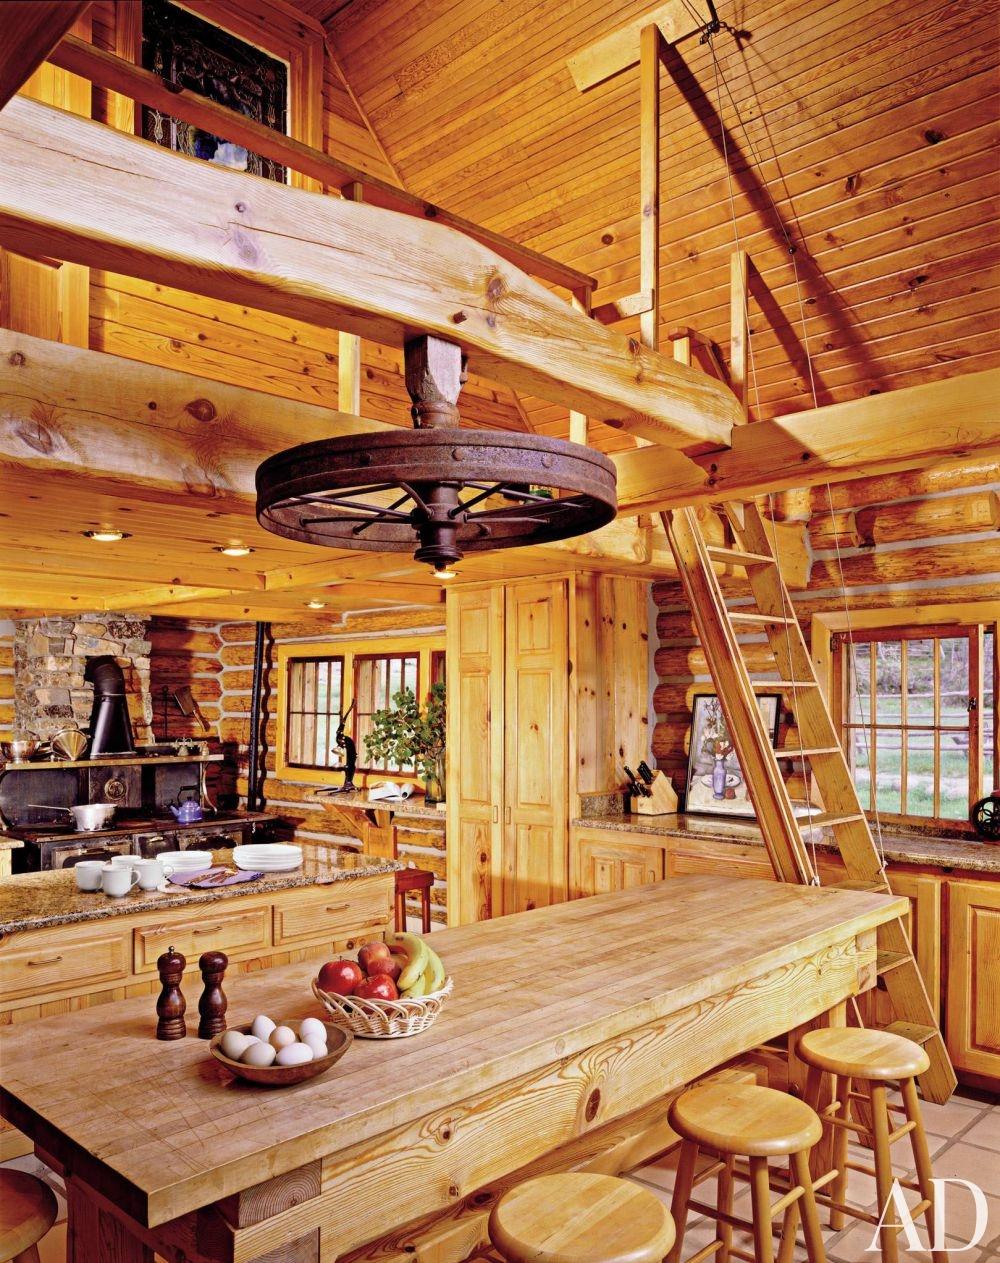 rustic-kitchen-idaho-200912_1000-watermarked